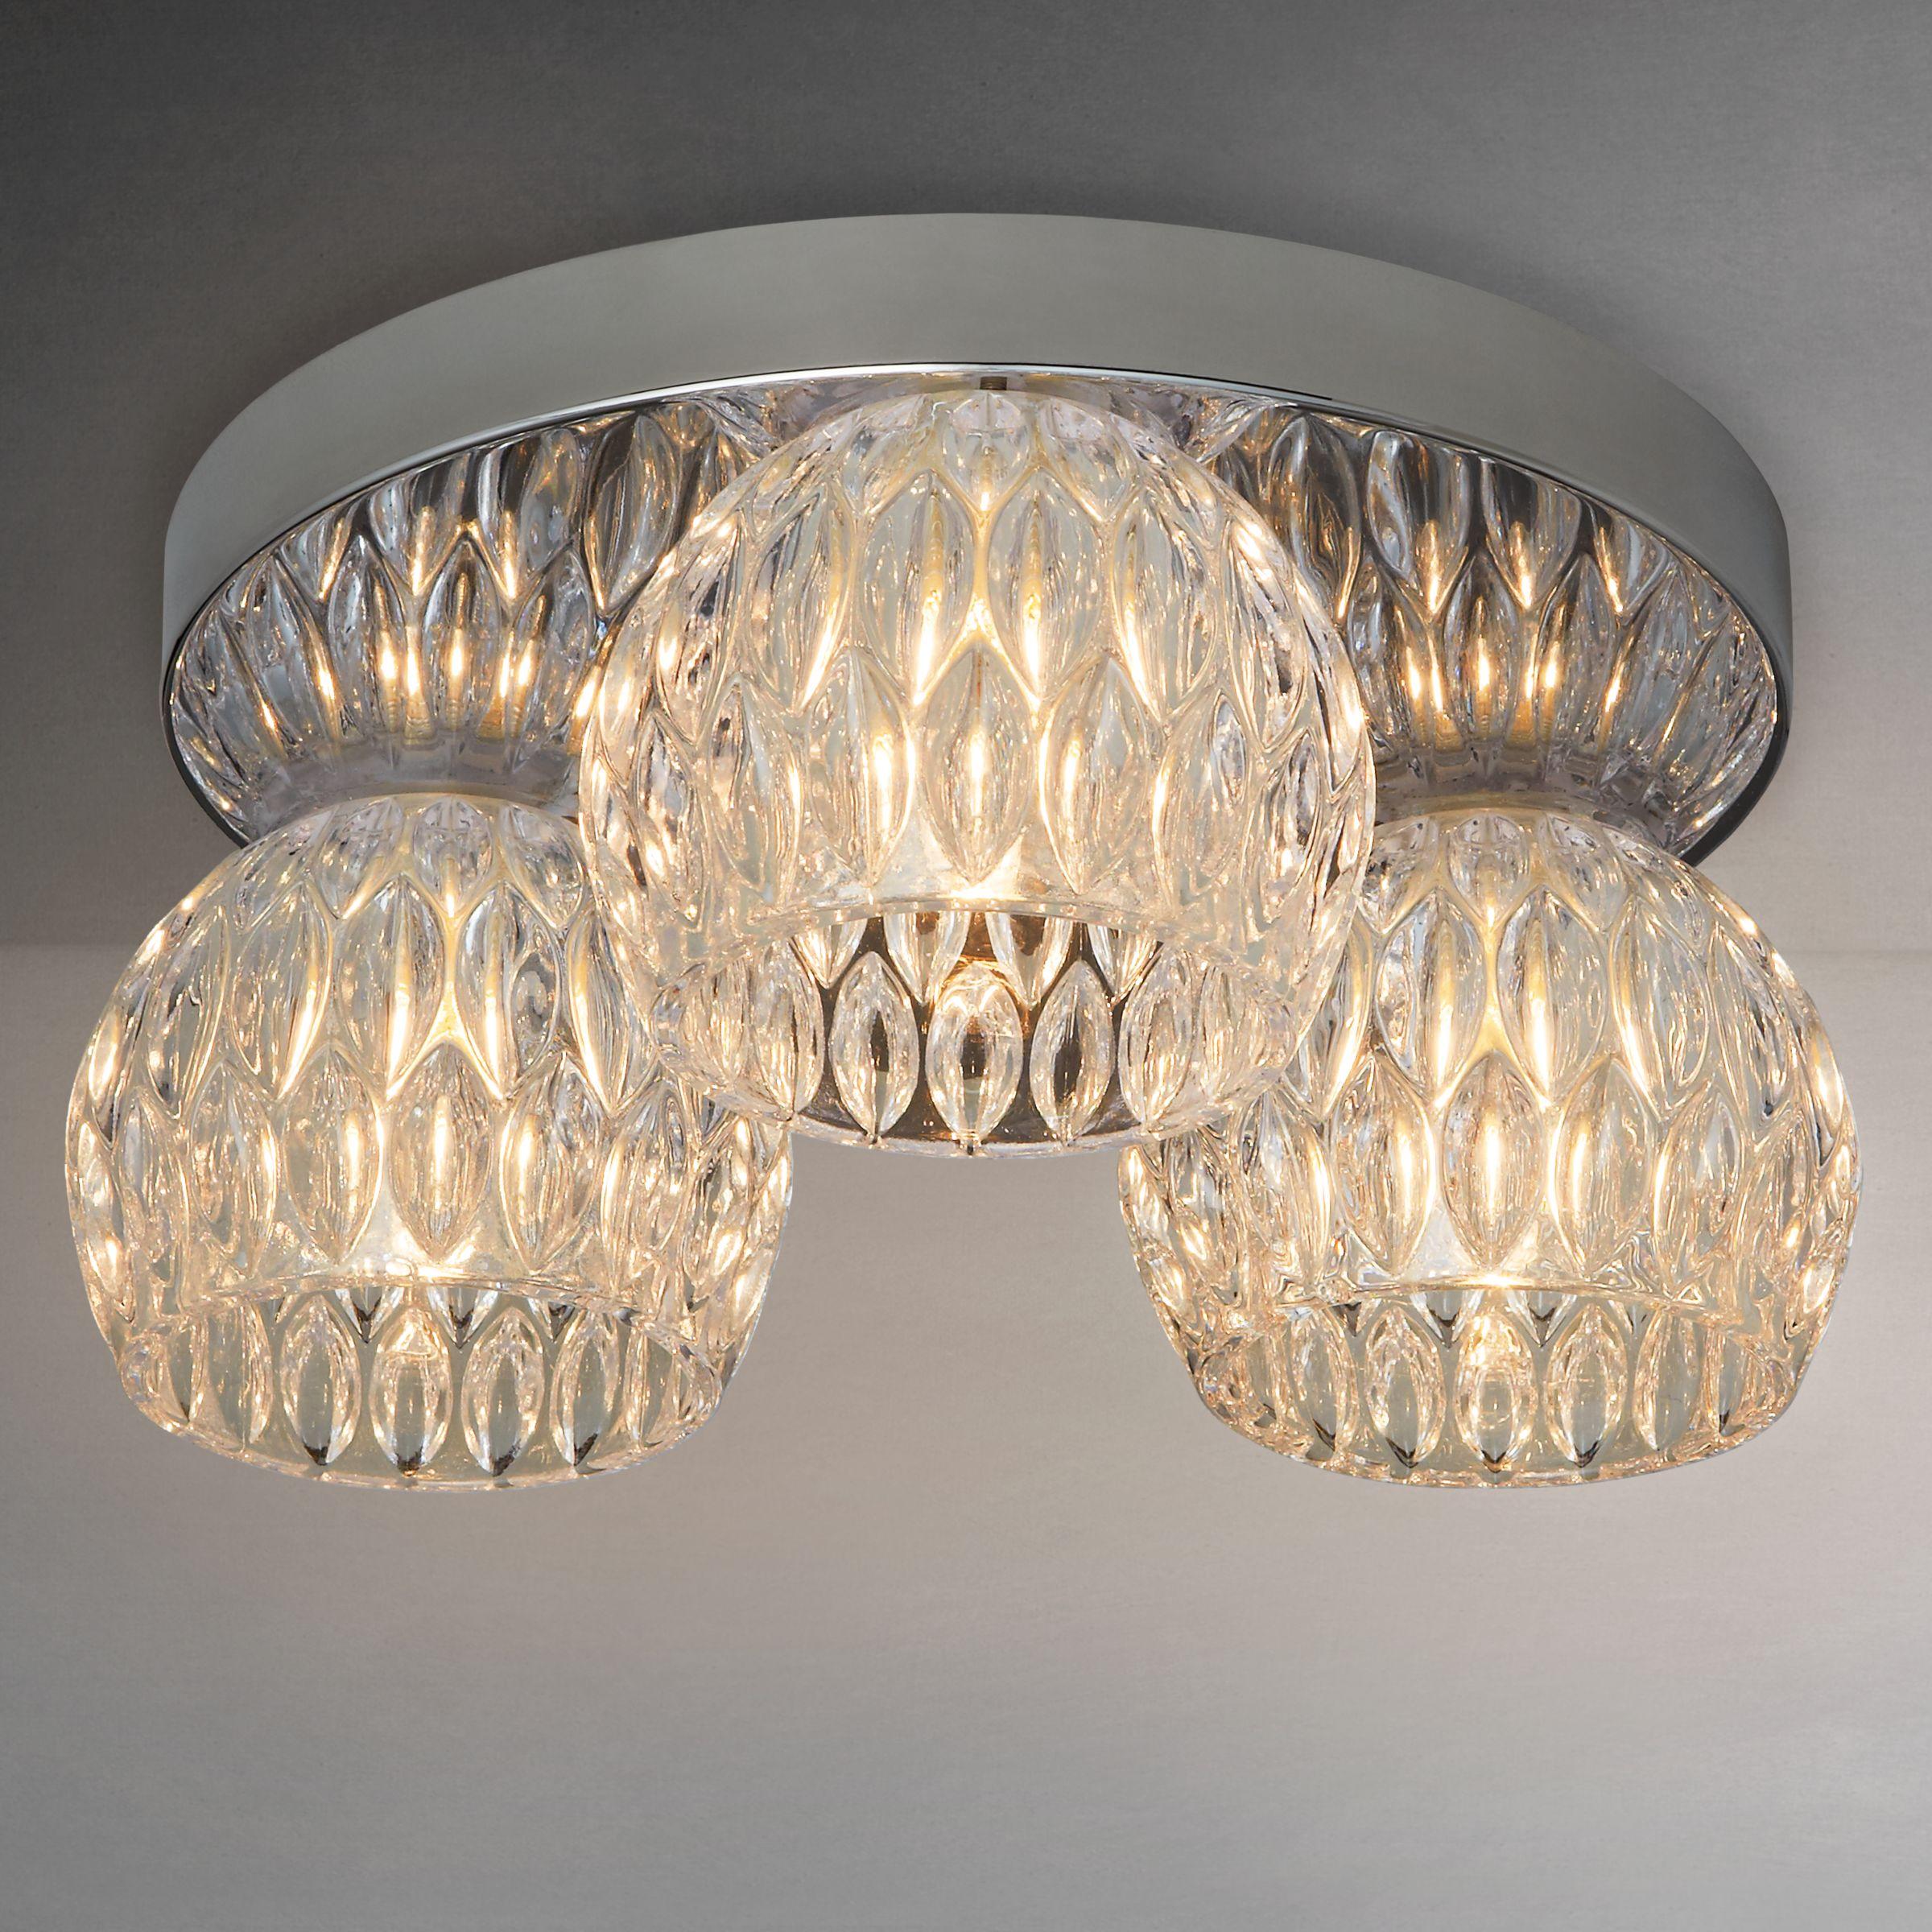 Flush Ceiling Lights John Lewis : John lewis emilia crystal drum flush ceiling light